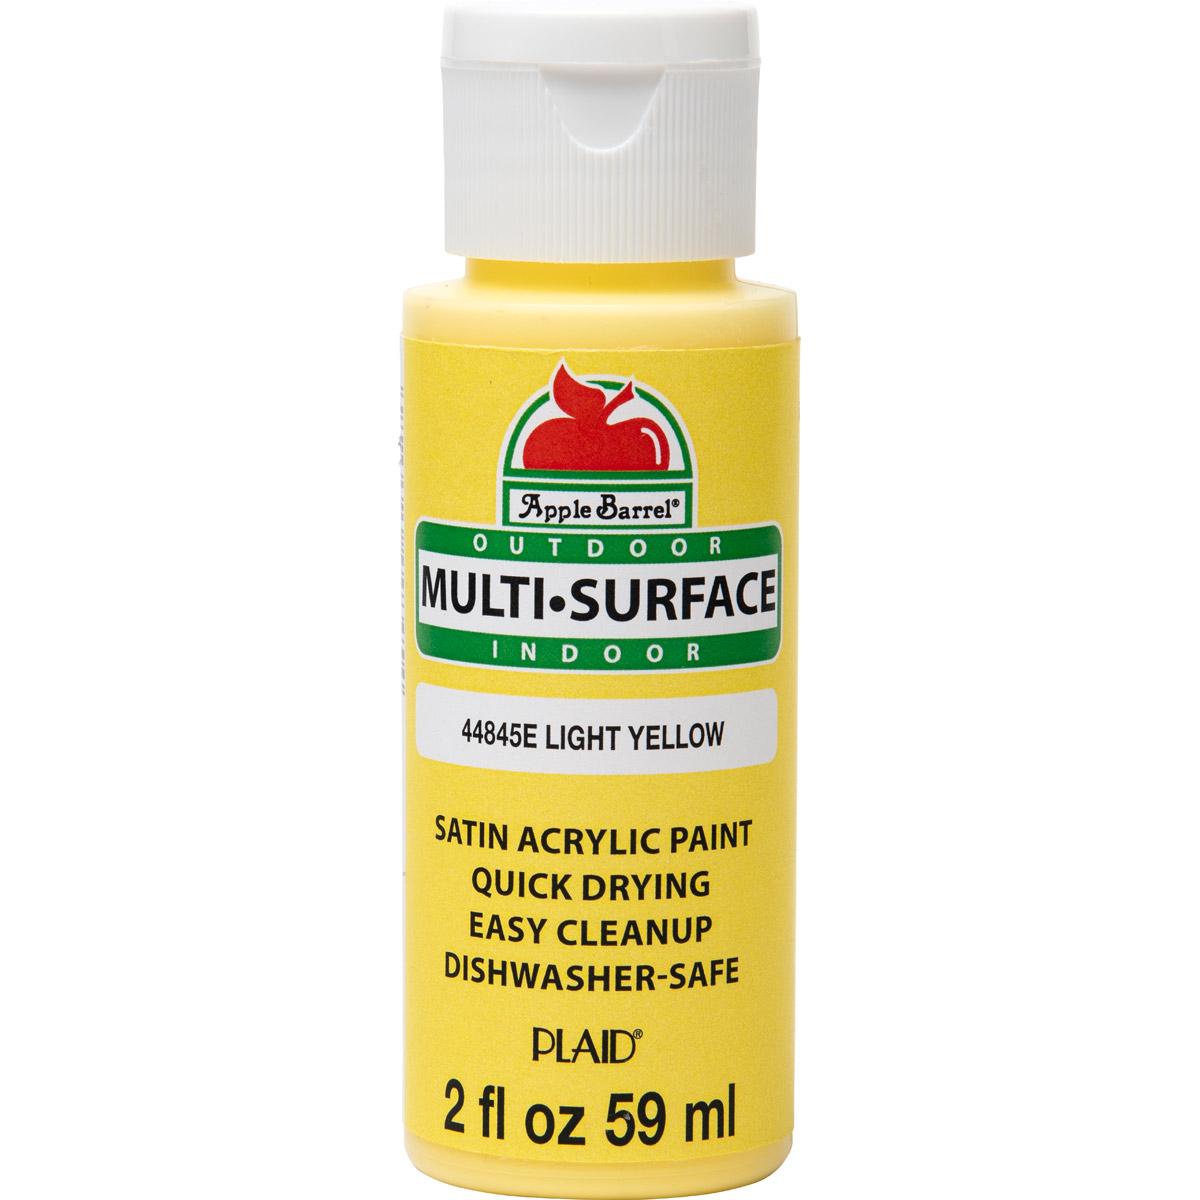 Apple Barrel ® Multi-Surface Satin Acrylic Paints - Light Yellow, 2 oz. - 44845E